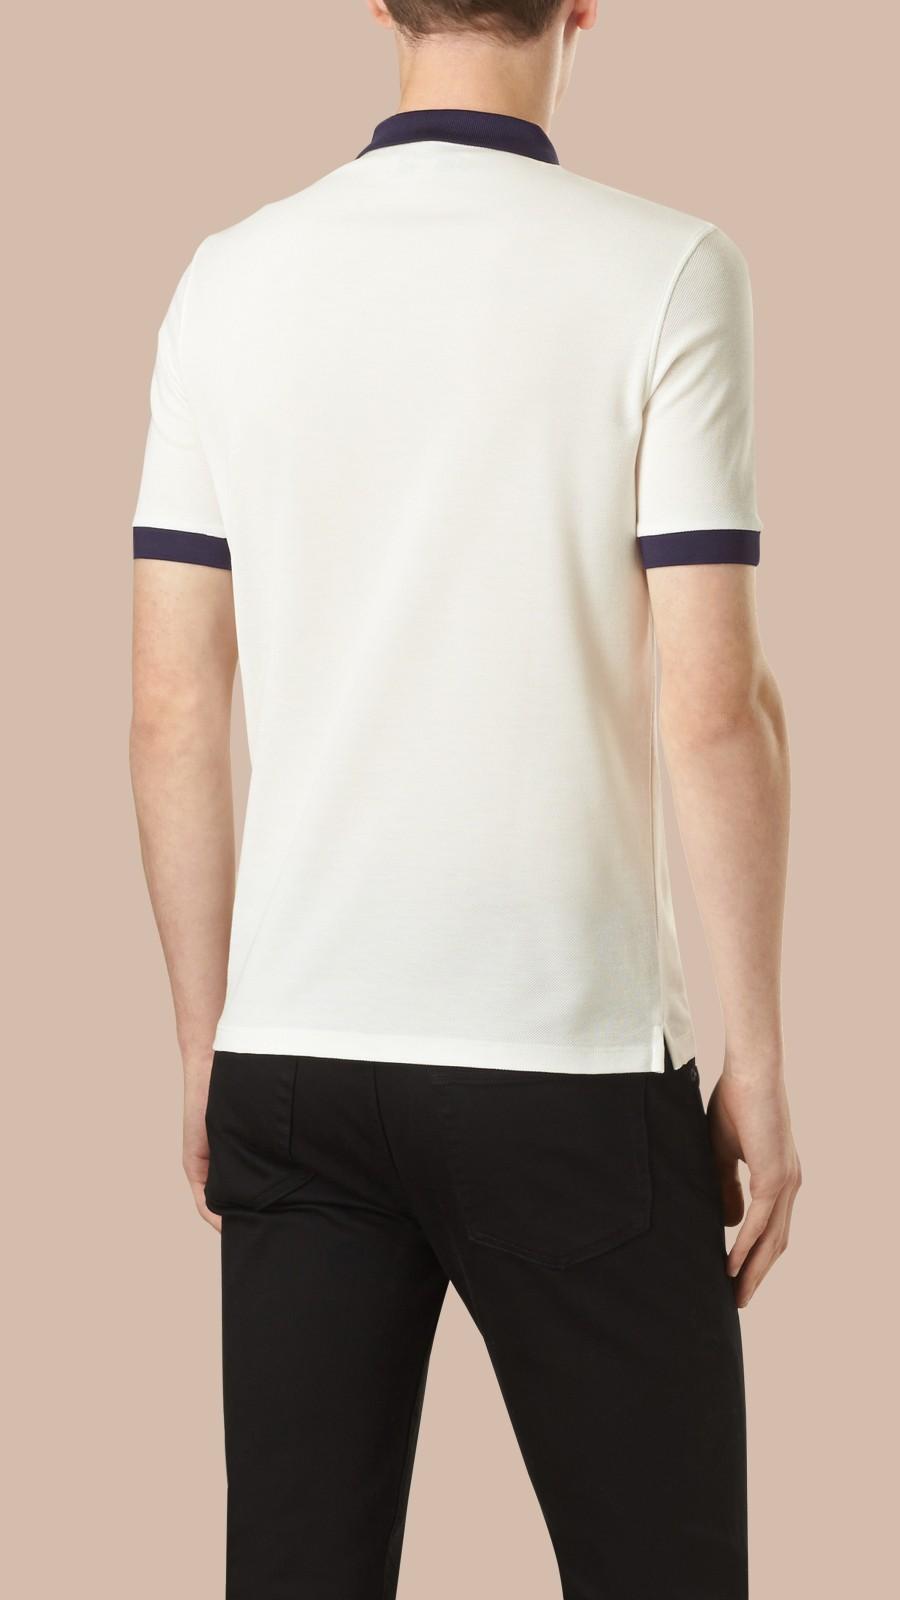 White/navy Mercerised Cotton Polo Shirt White/navy - Image 4